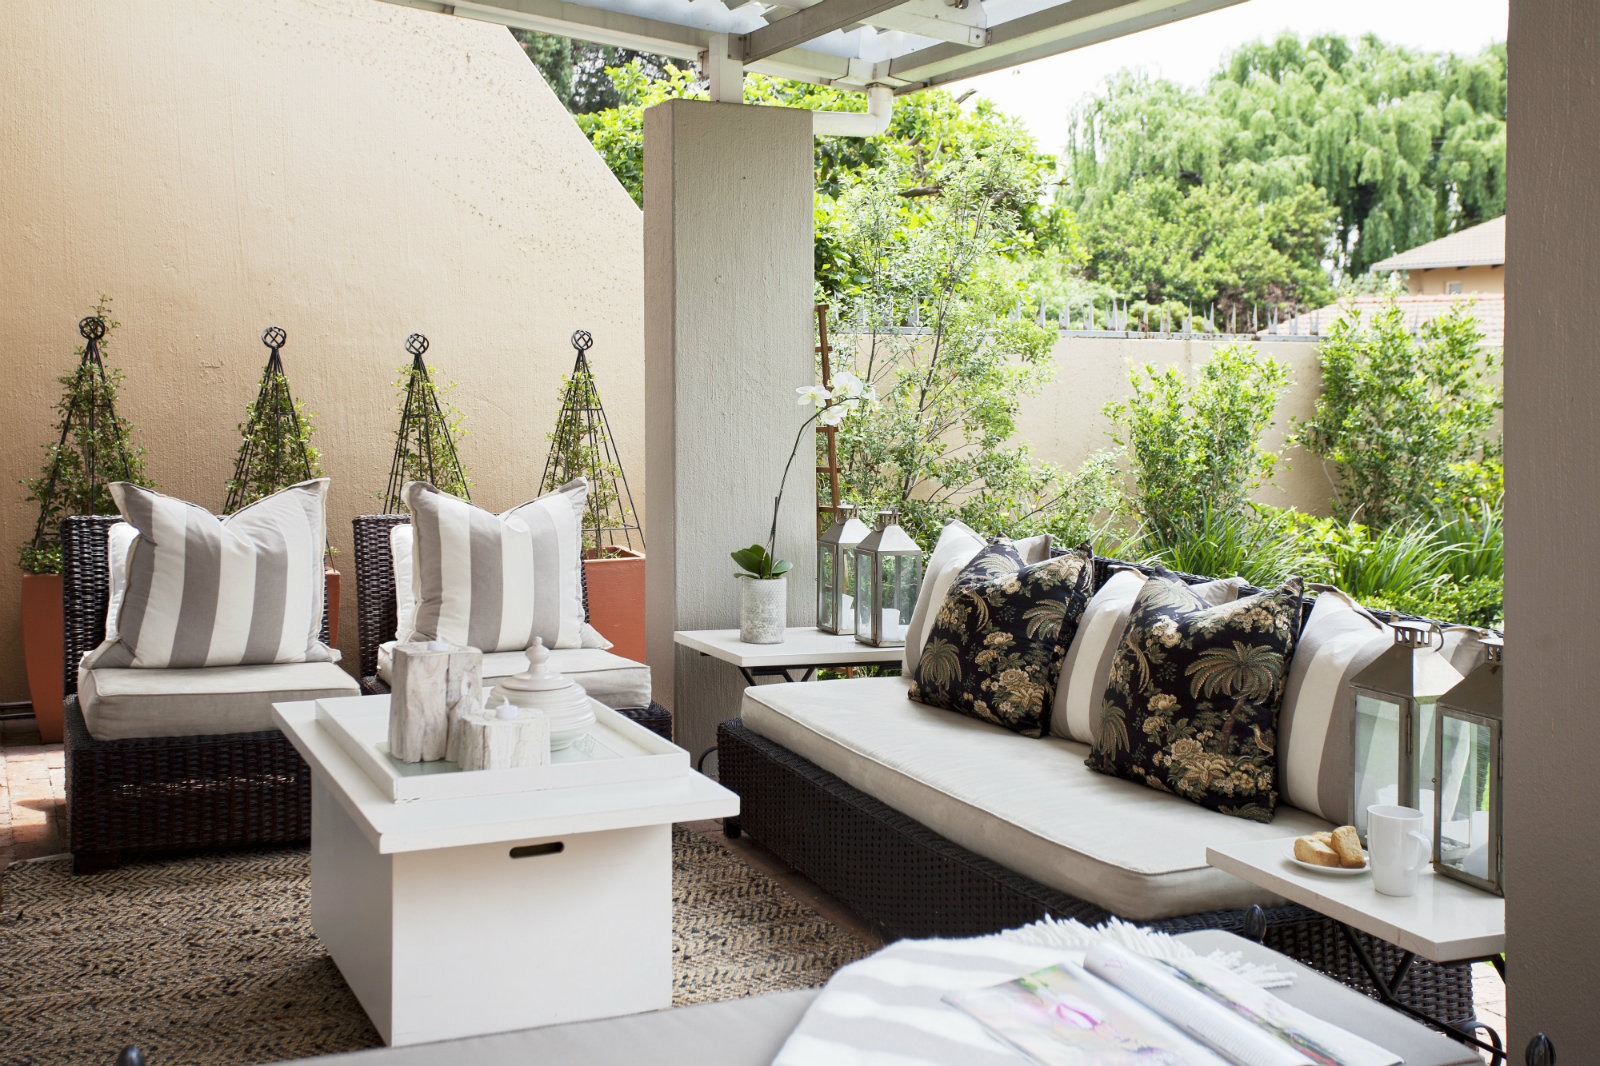 3-kreativno-udobno-i-dostapno-7-soveti-so-koi-vashiot-balkon-kje-go-pretvorite-vo-dnevna-soba-www.kafepauza.mk_